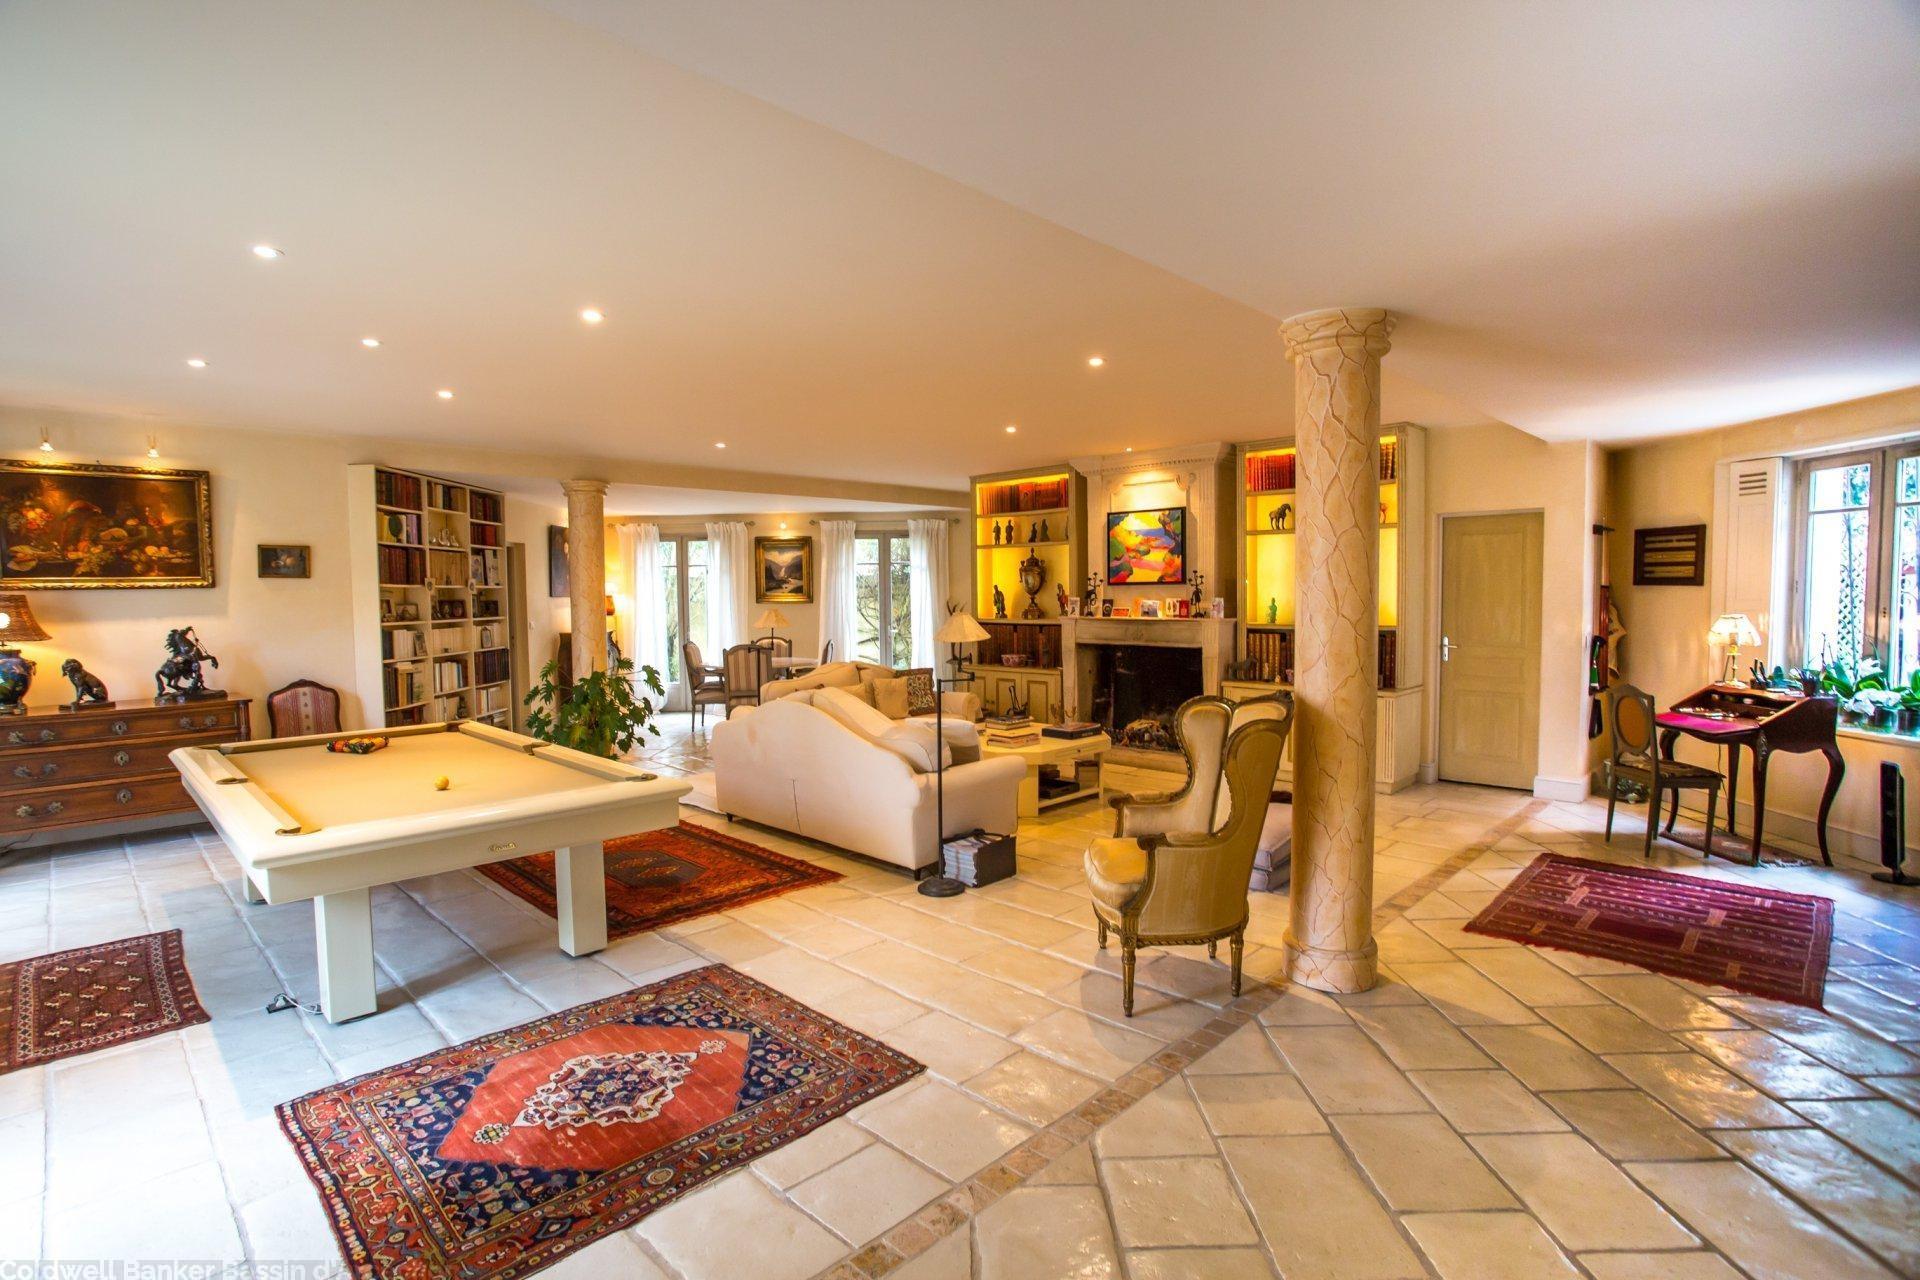 Vente maison villa bordeaux cauderan belle villa for Maison cauderan